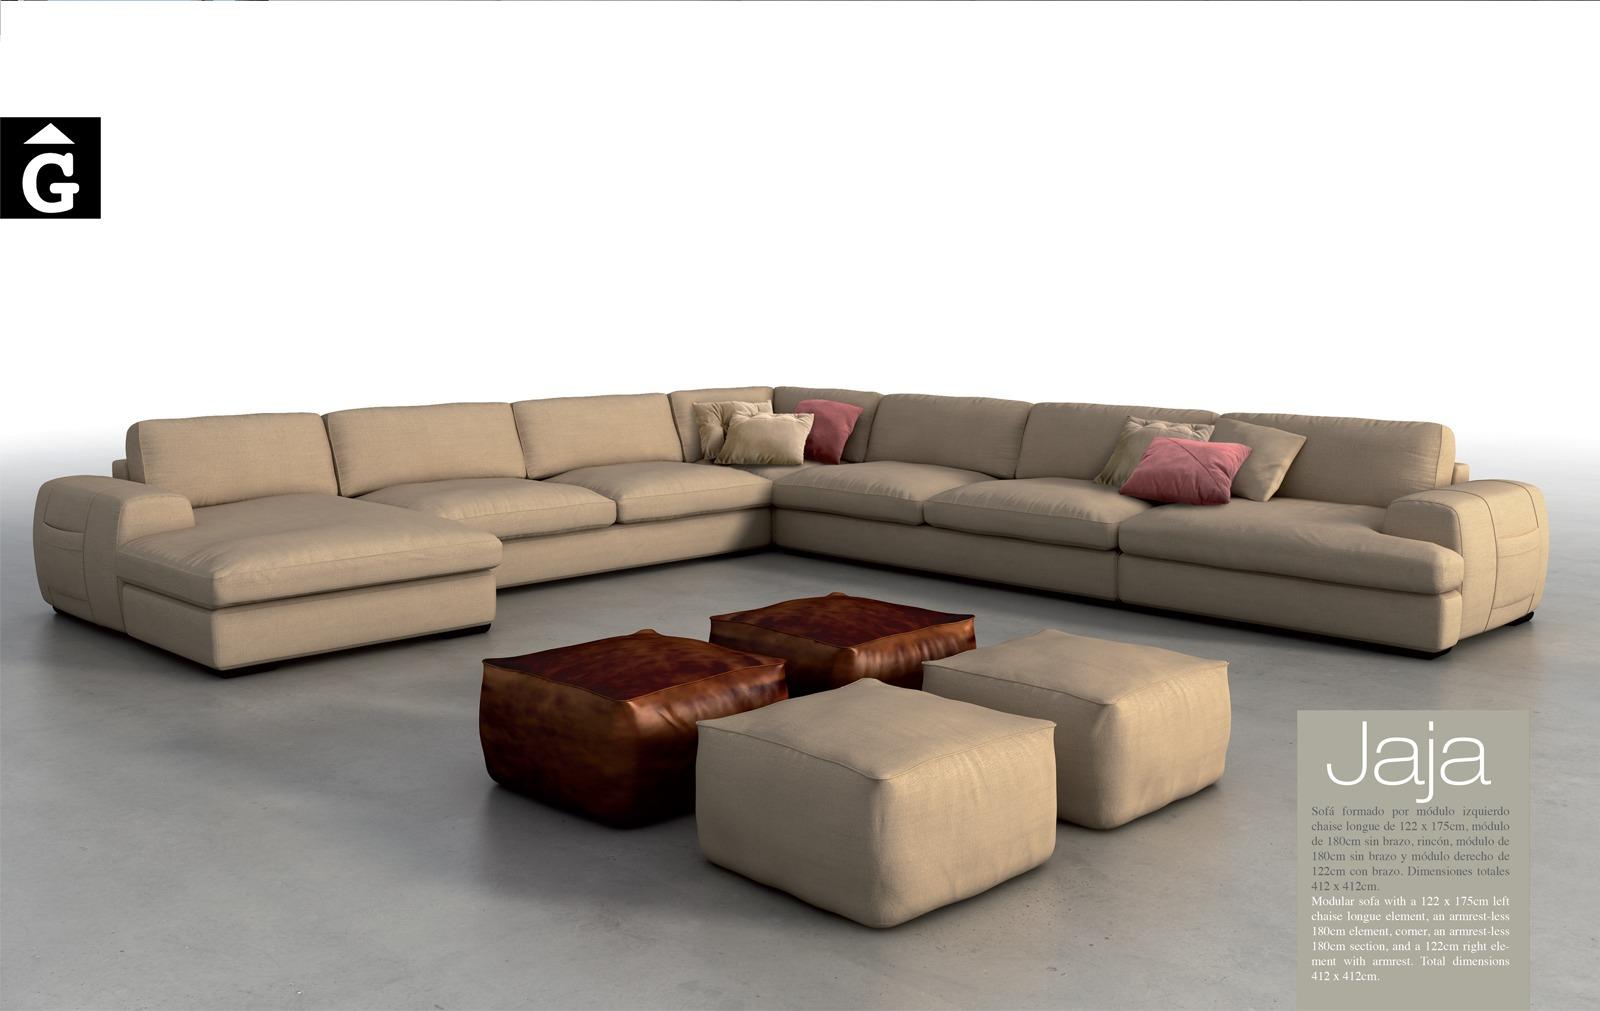 Jaja Moradillo by mobles Gifreu tapisseria de qualitat sofas relax llits puff pouf chaixelongues butaques sillons